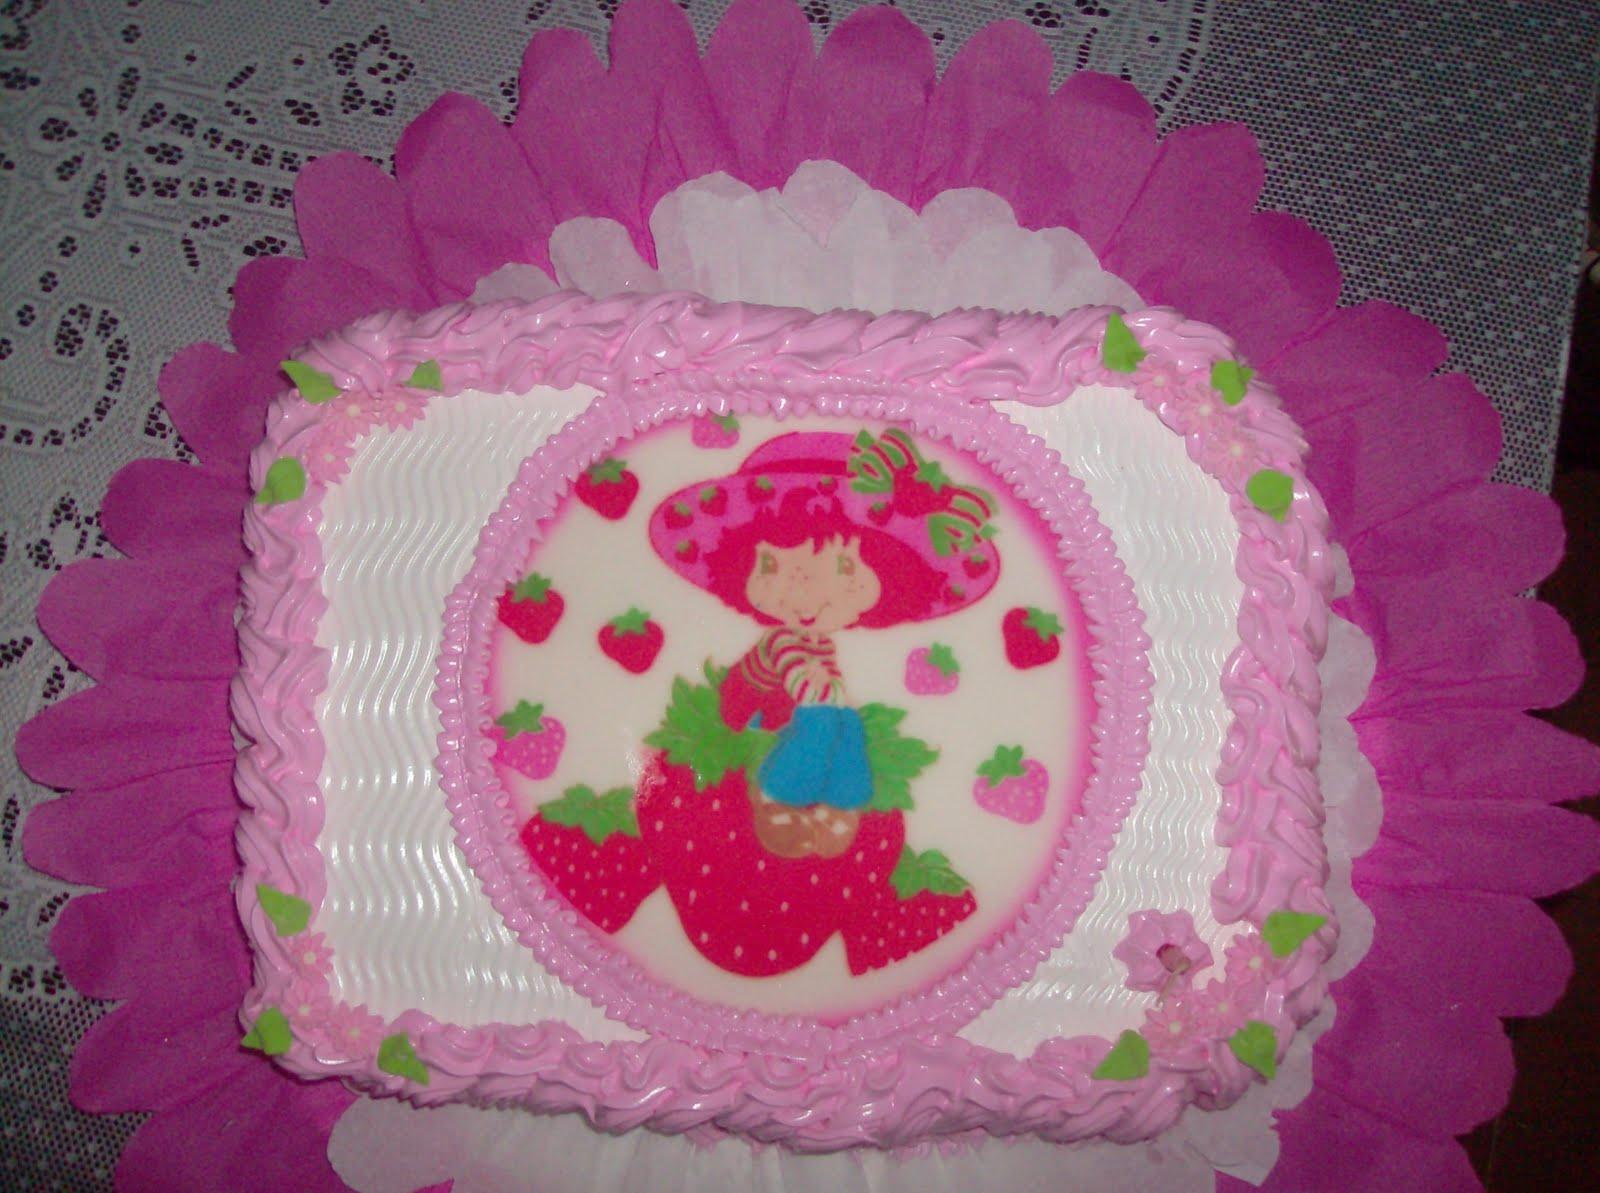 ... Tortas y Gelatinas Decoradas, Pasapalos, etc: Tierna Torta de Fresita